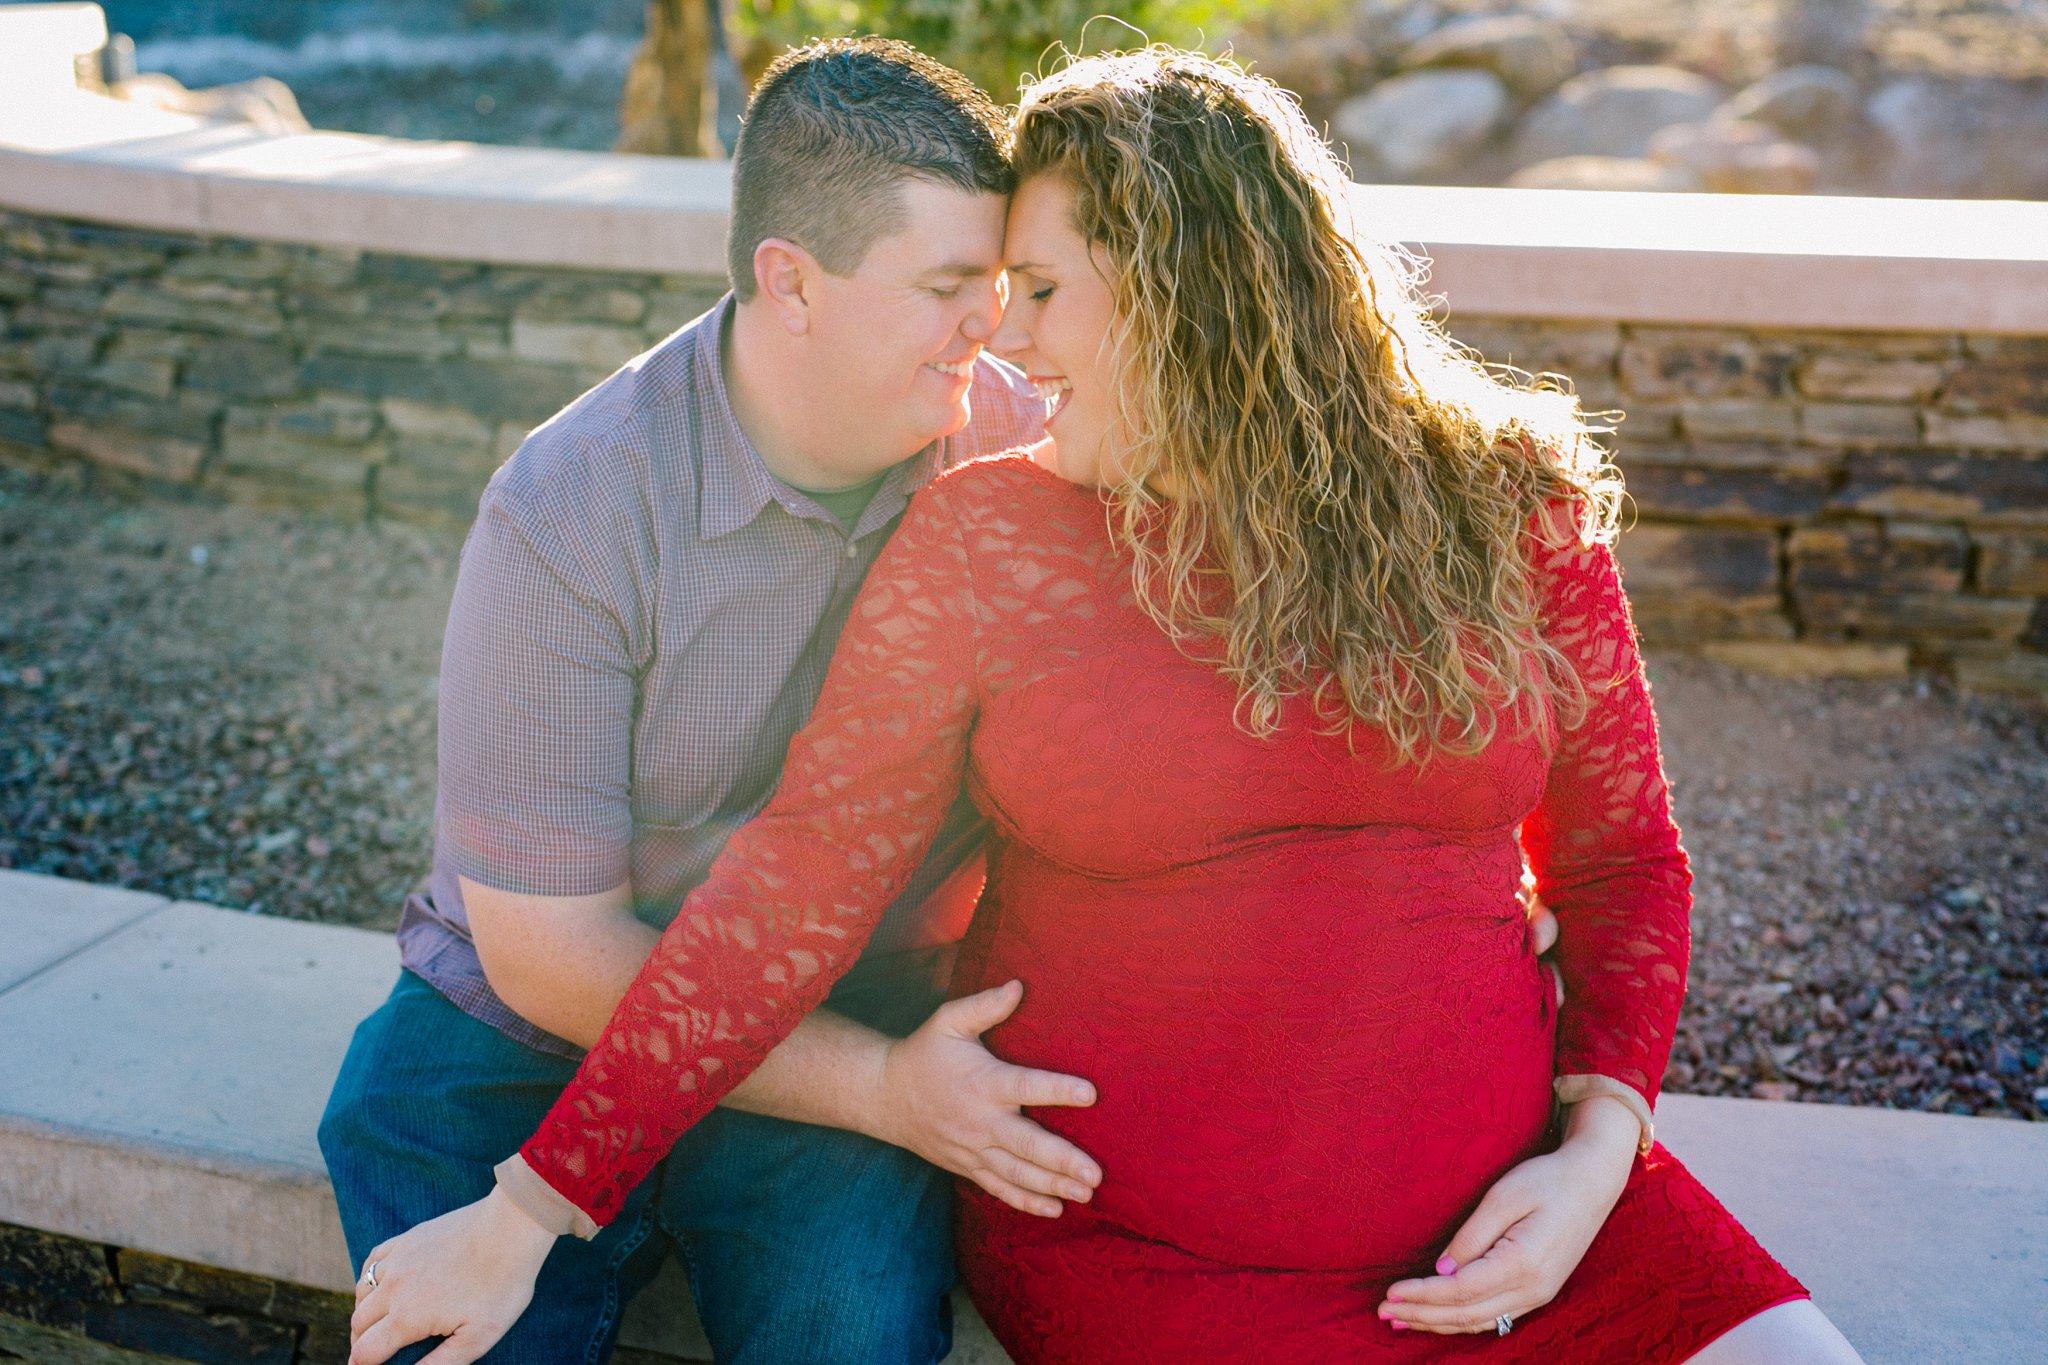 Goodyear maternity photos